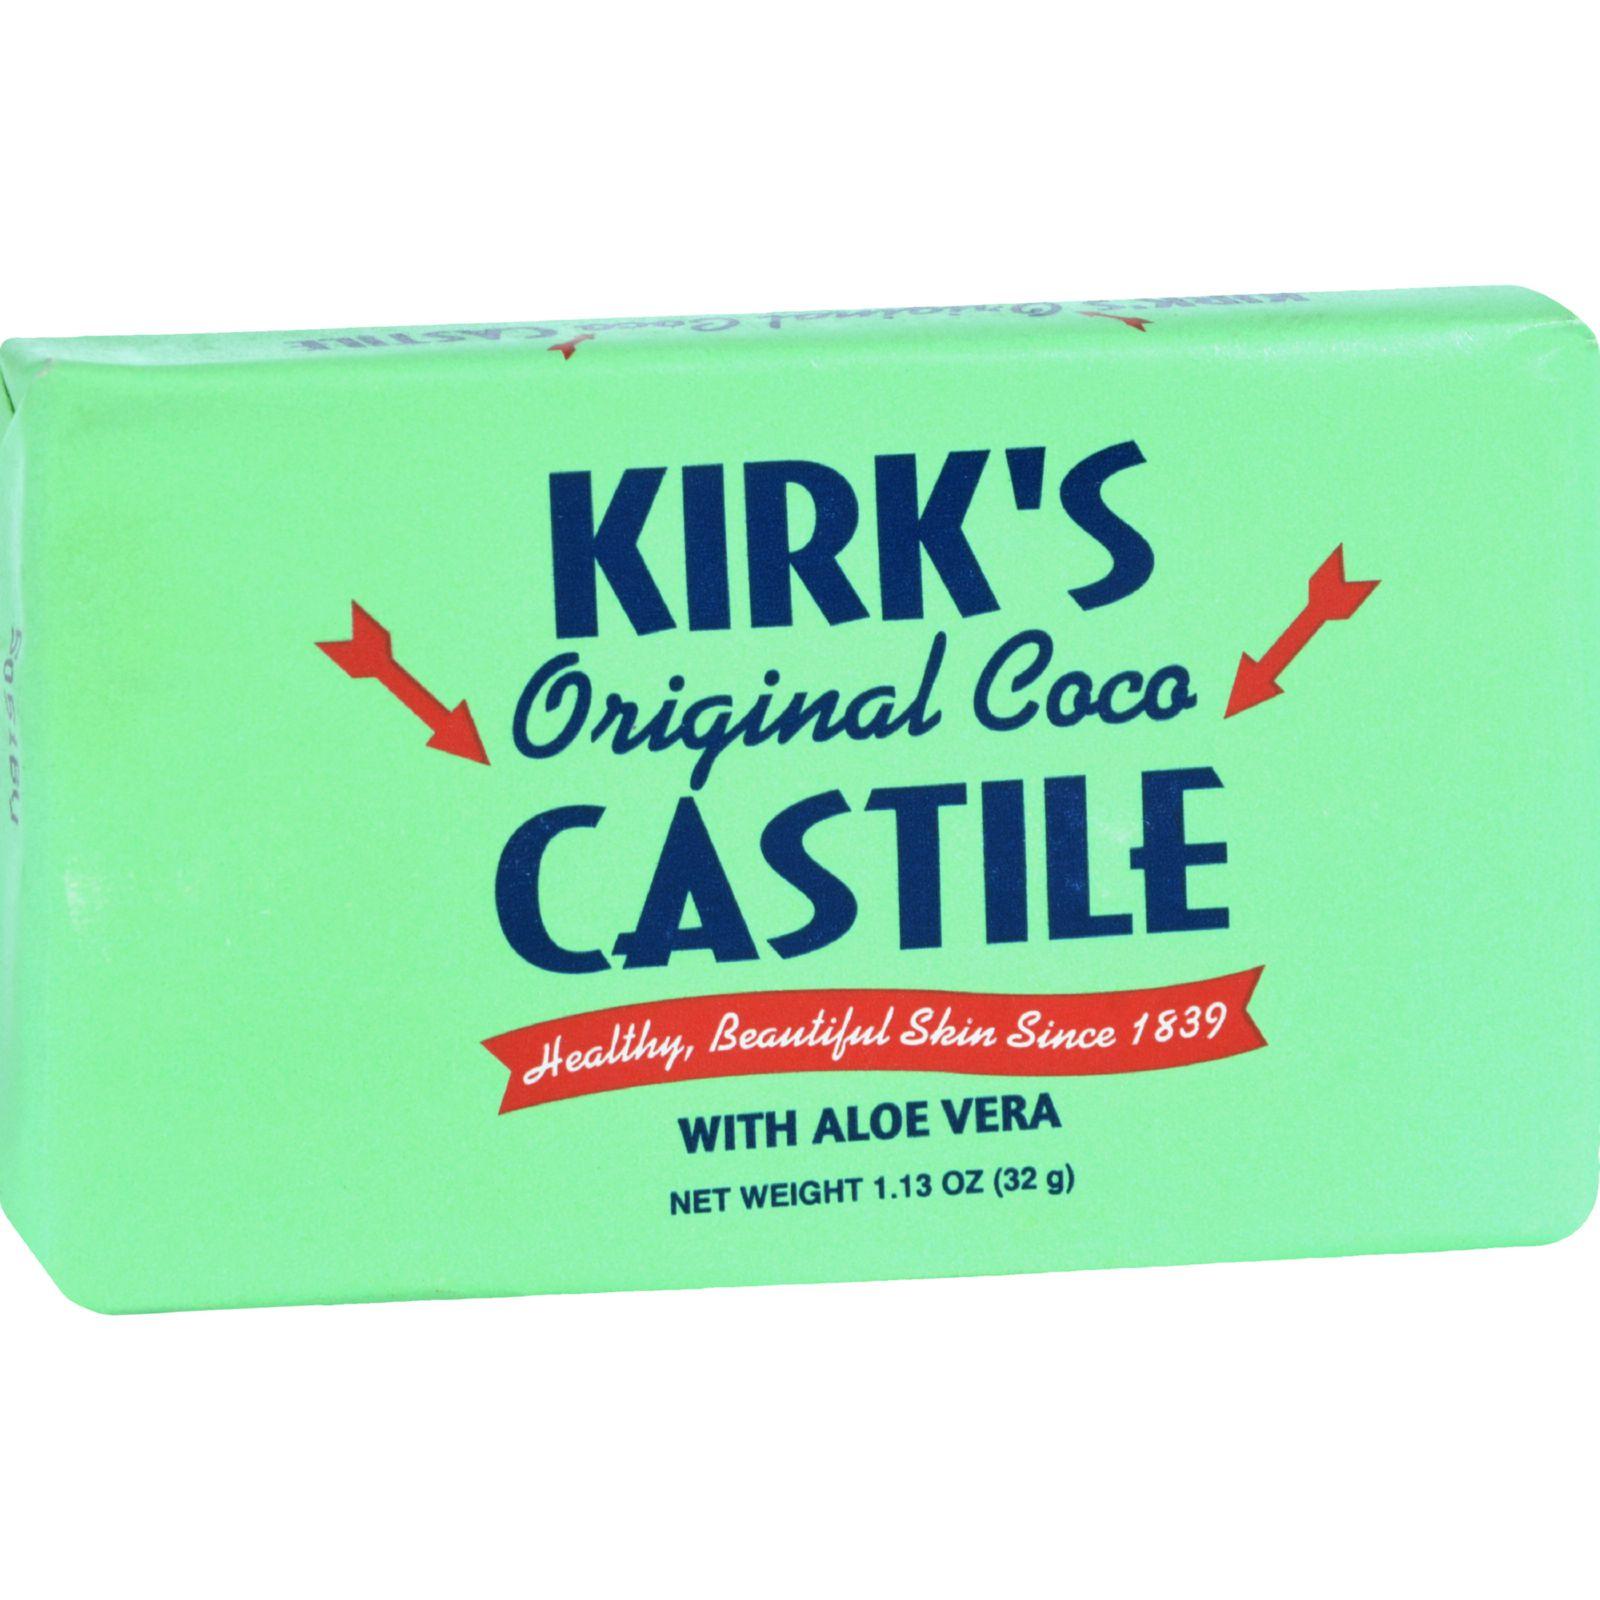 Kirks Natural Bar Soap - Coco Castile - Aloe Vera - Trave...